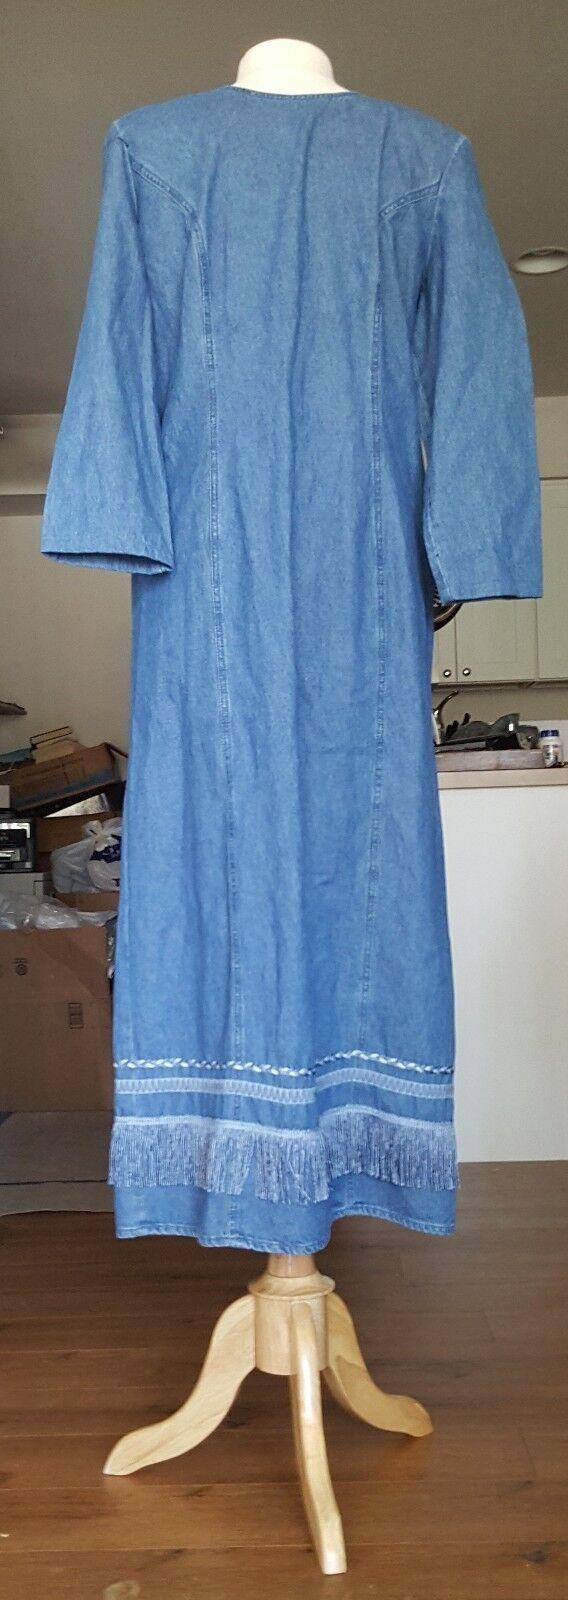 Women's SKETCHES bluee Denim Jean Dress-Size 12